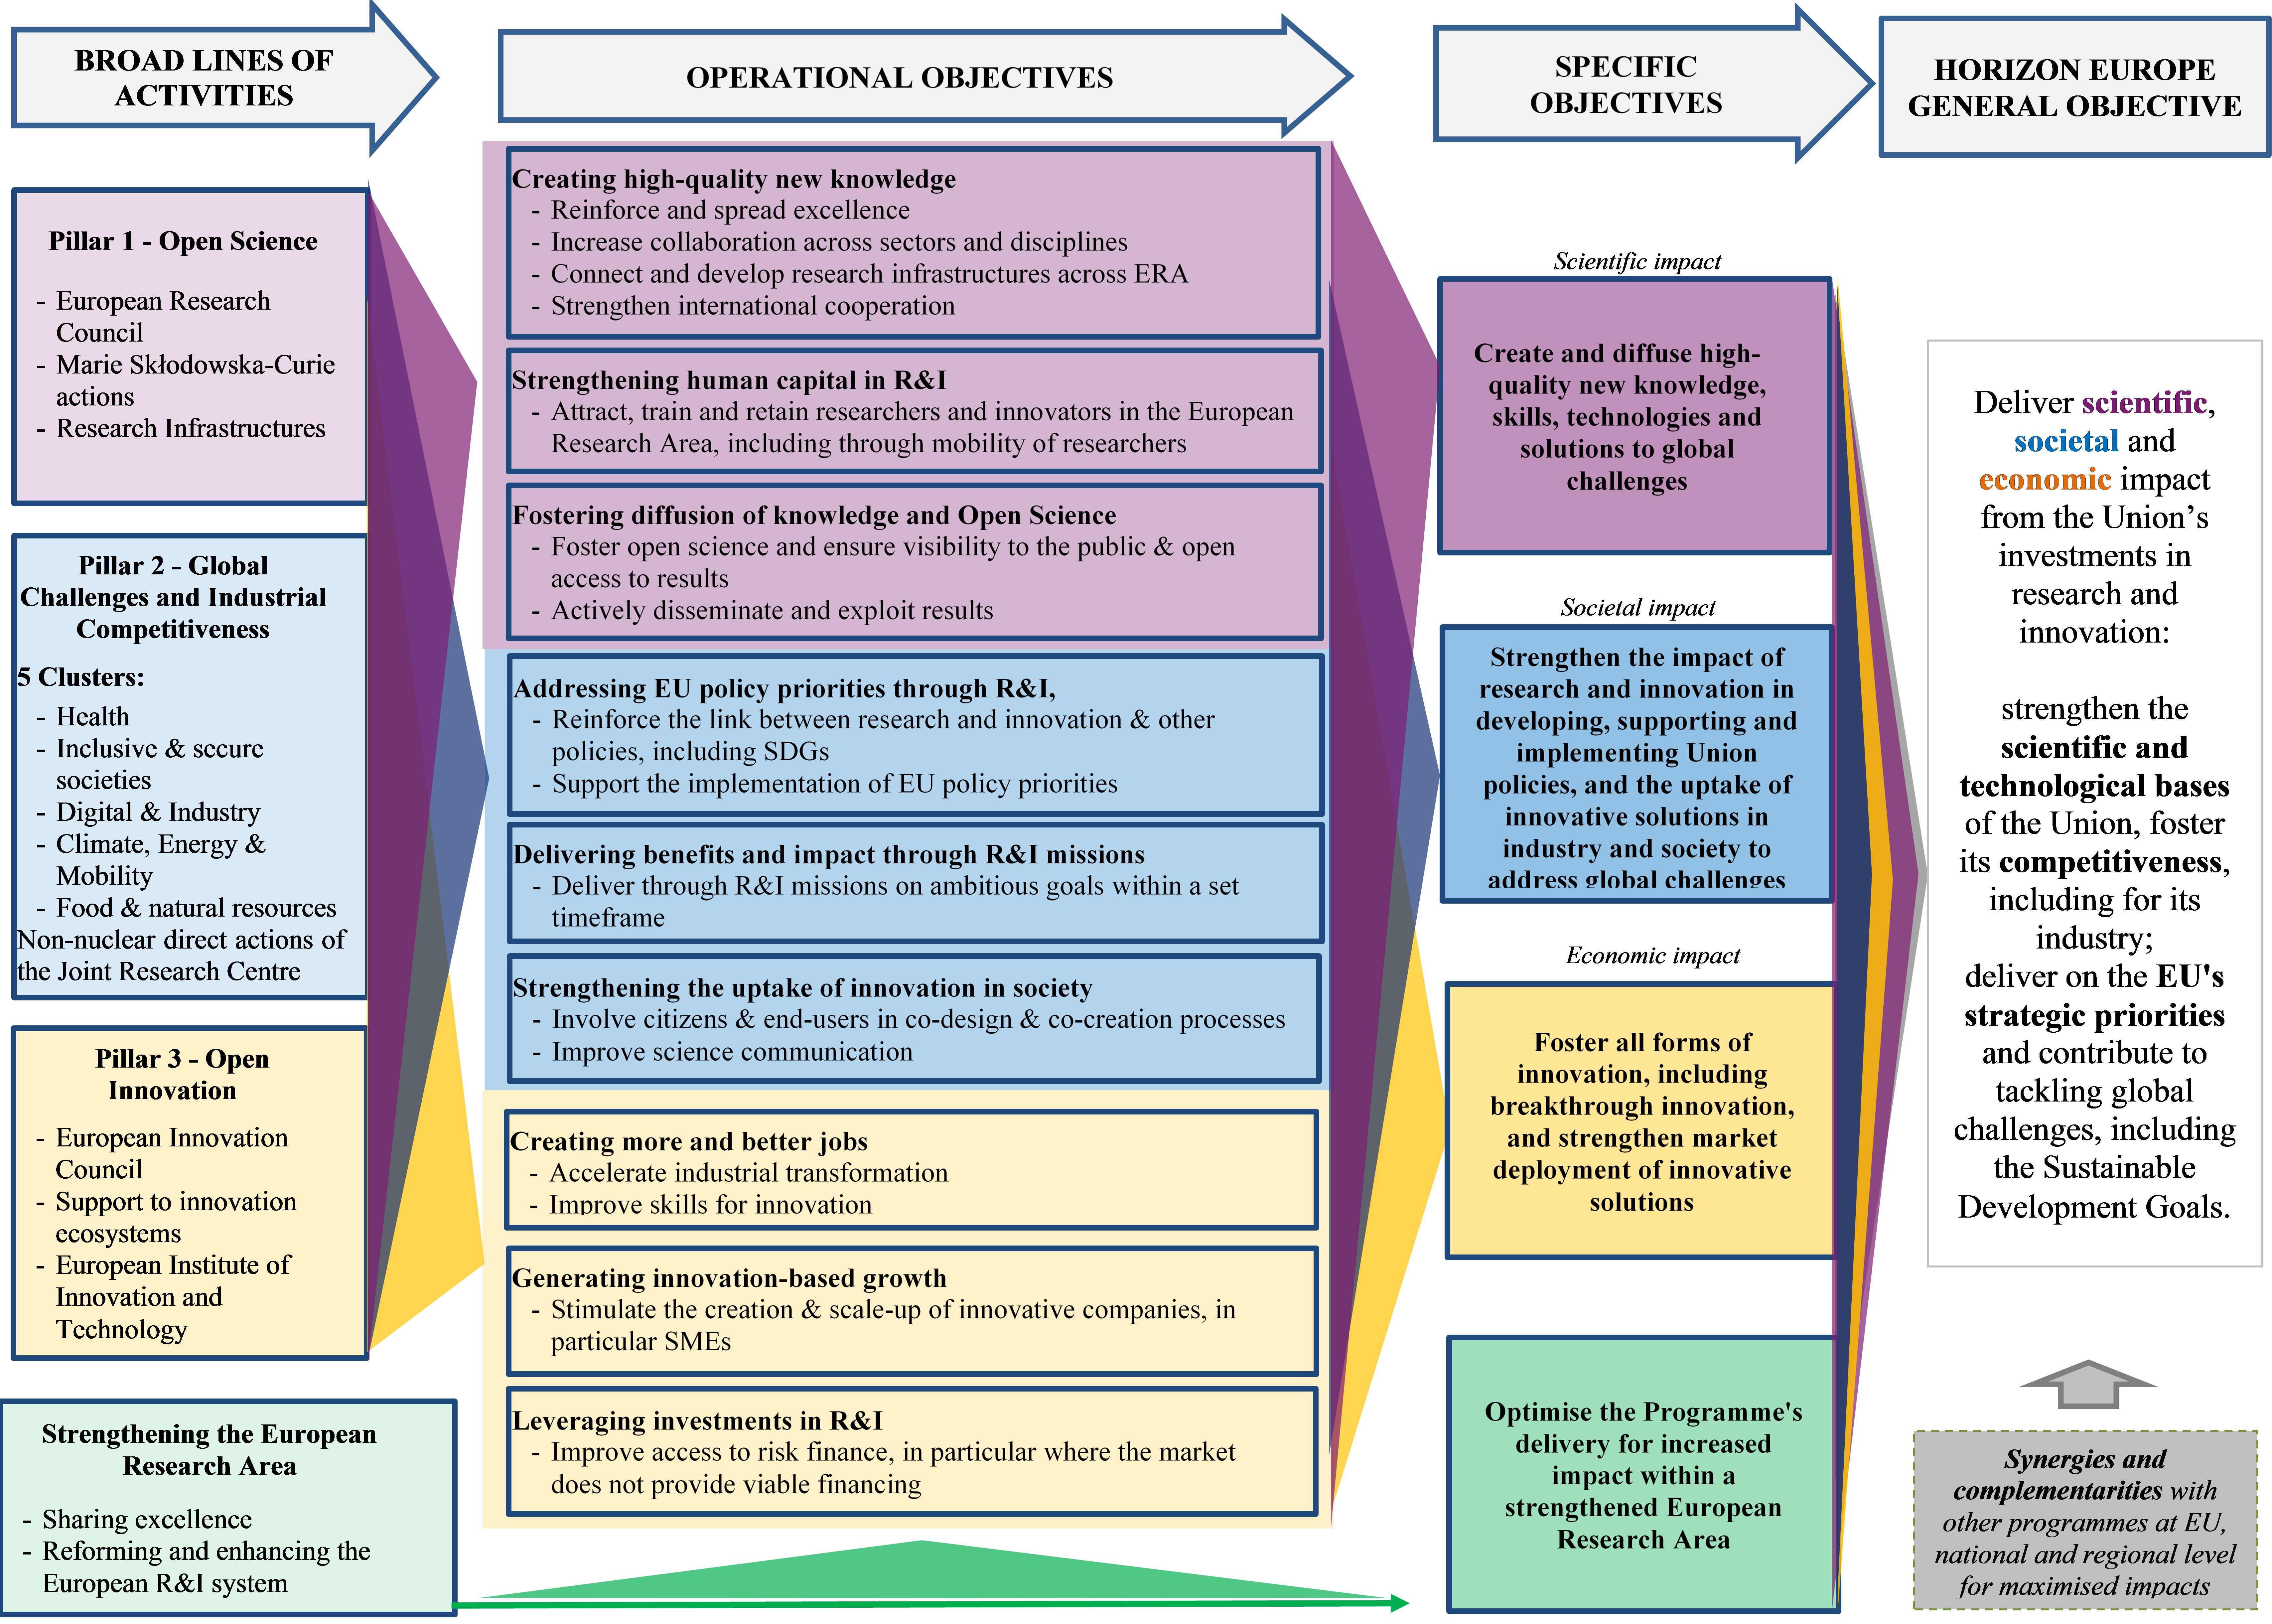 Figure 11 Intervention logic of Horizon Europe